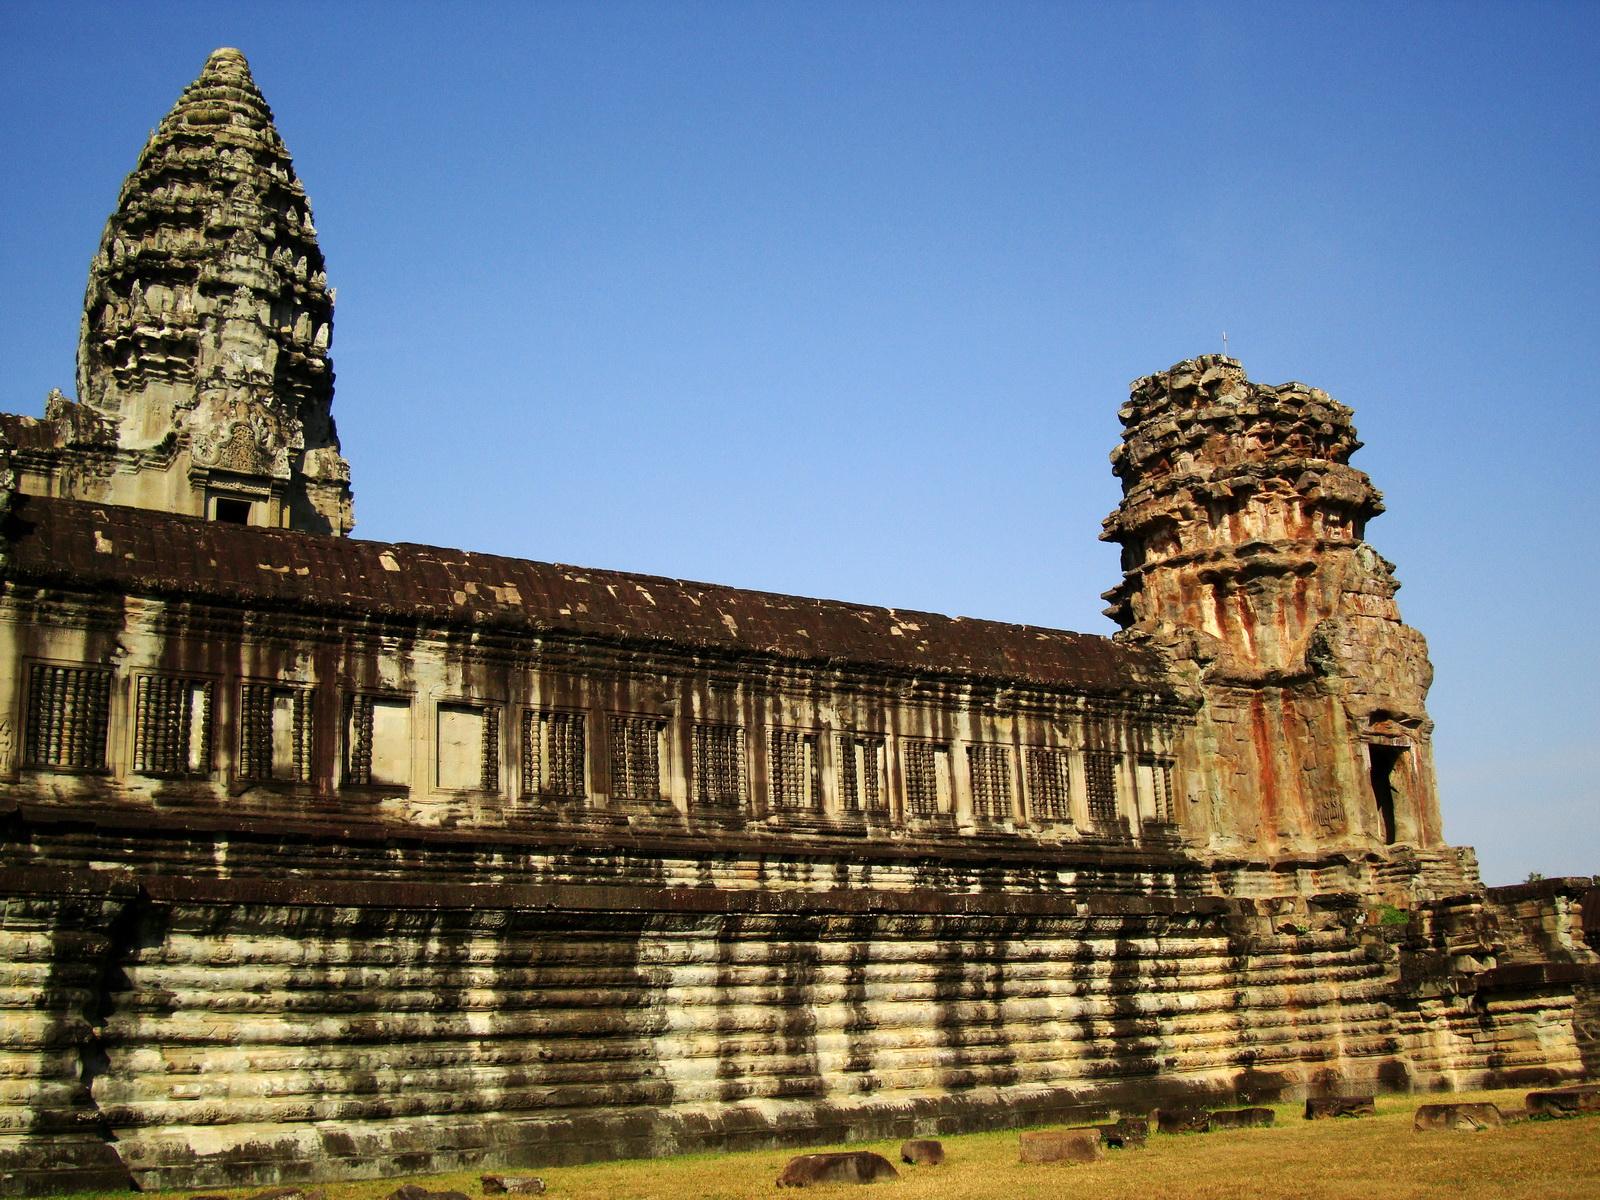 Angkor Wat Khmer architecture internal gallery E entrance 12